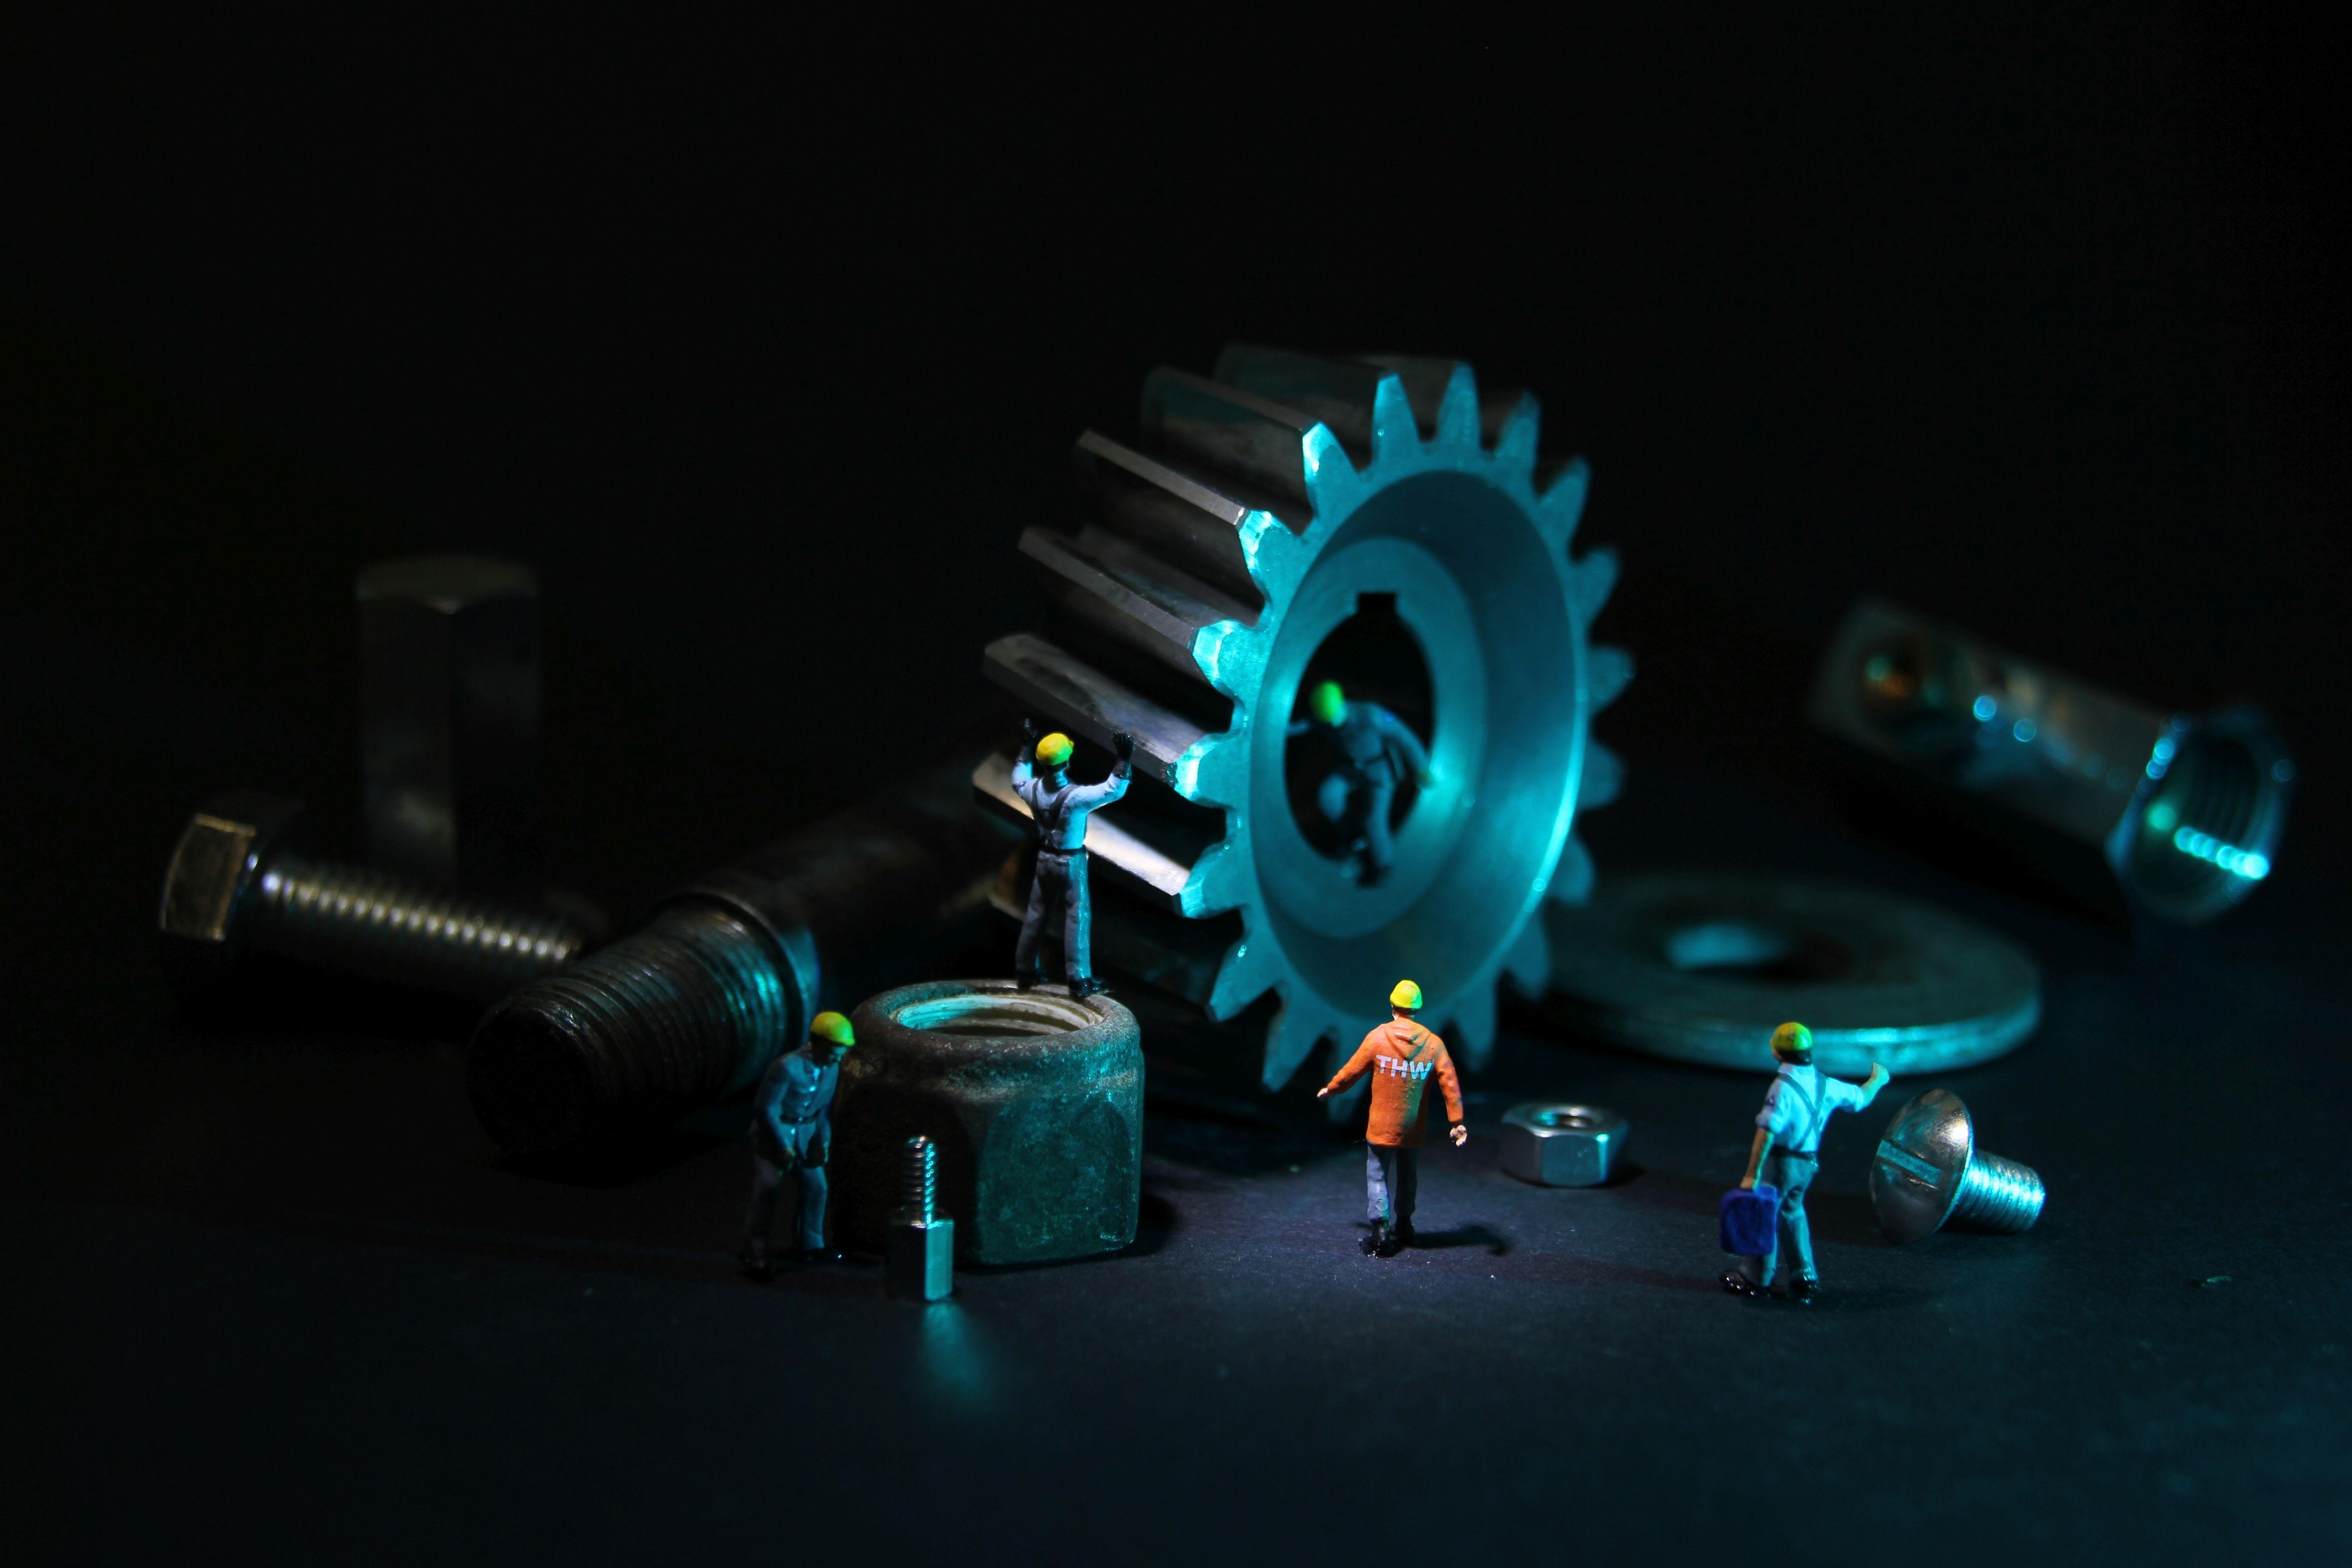 Canva - Tiny Mechanic Figures Next To Tools